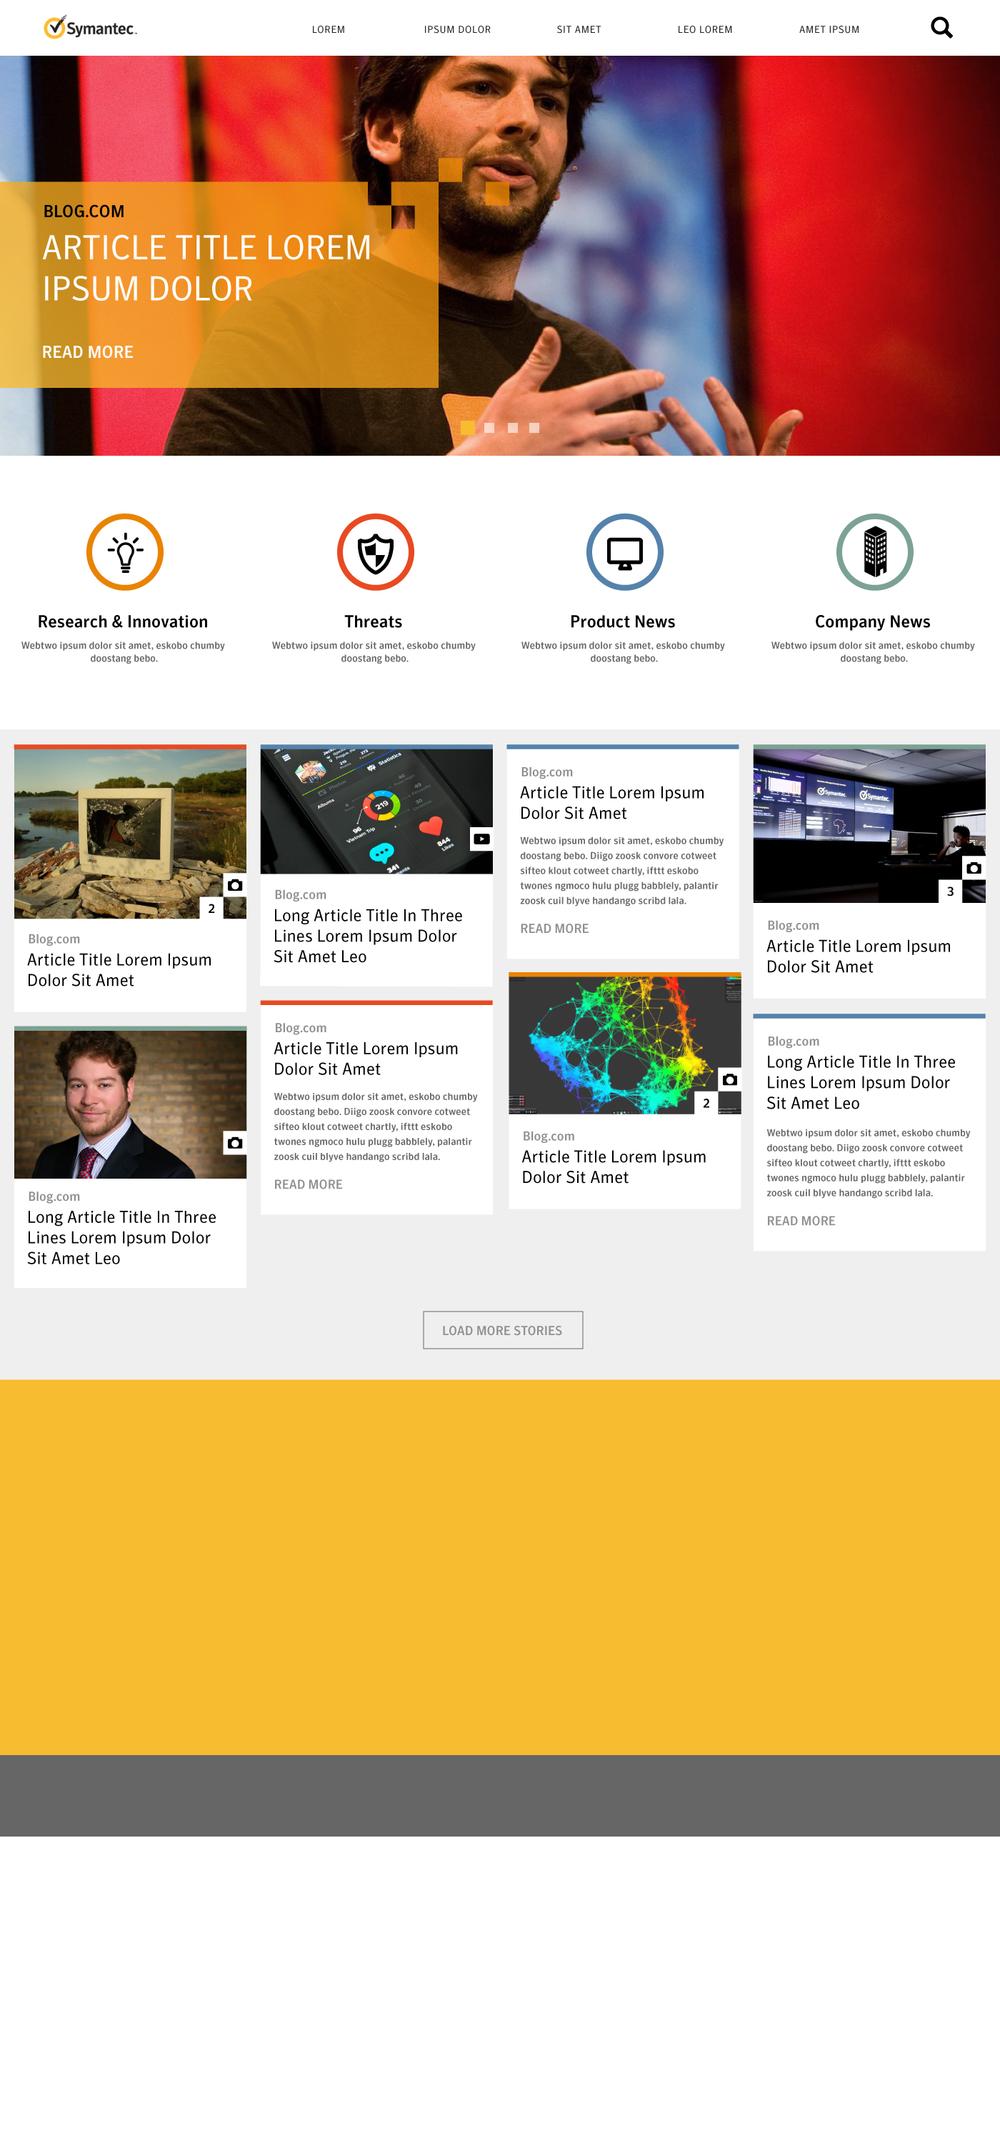 Symantec_Newsroom_01_01.jpg